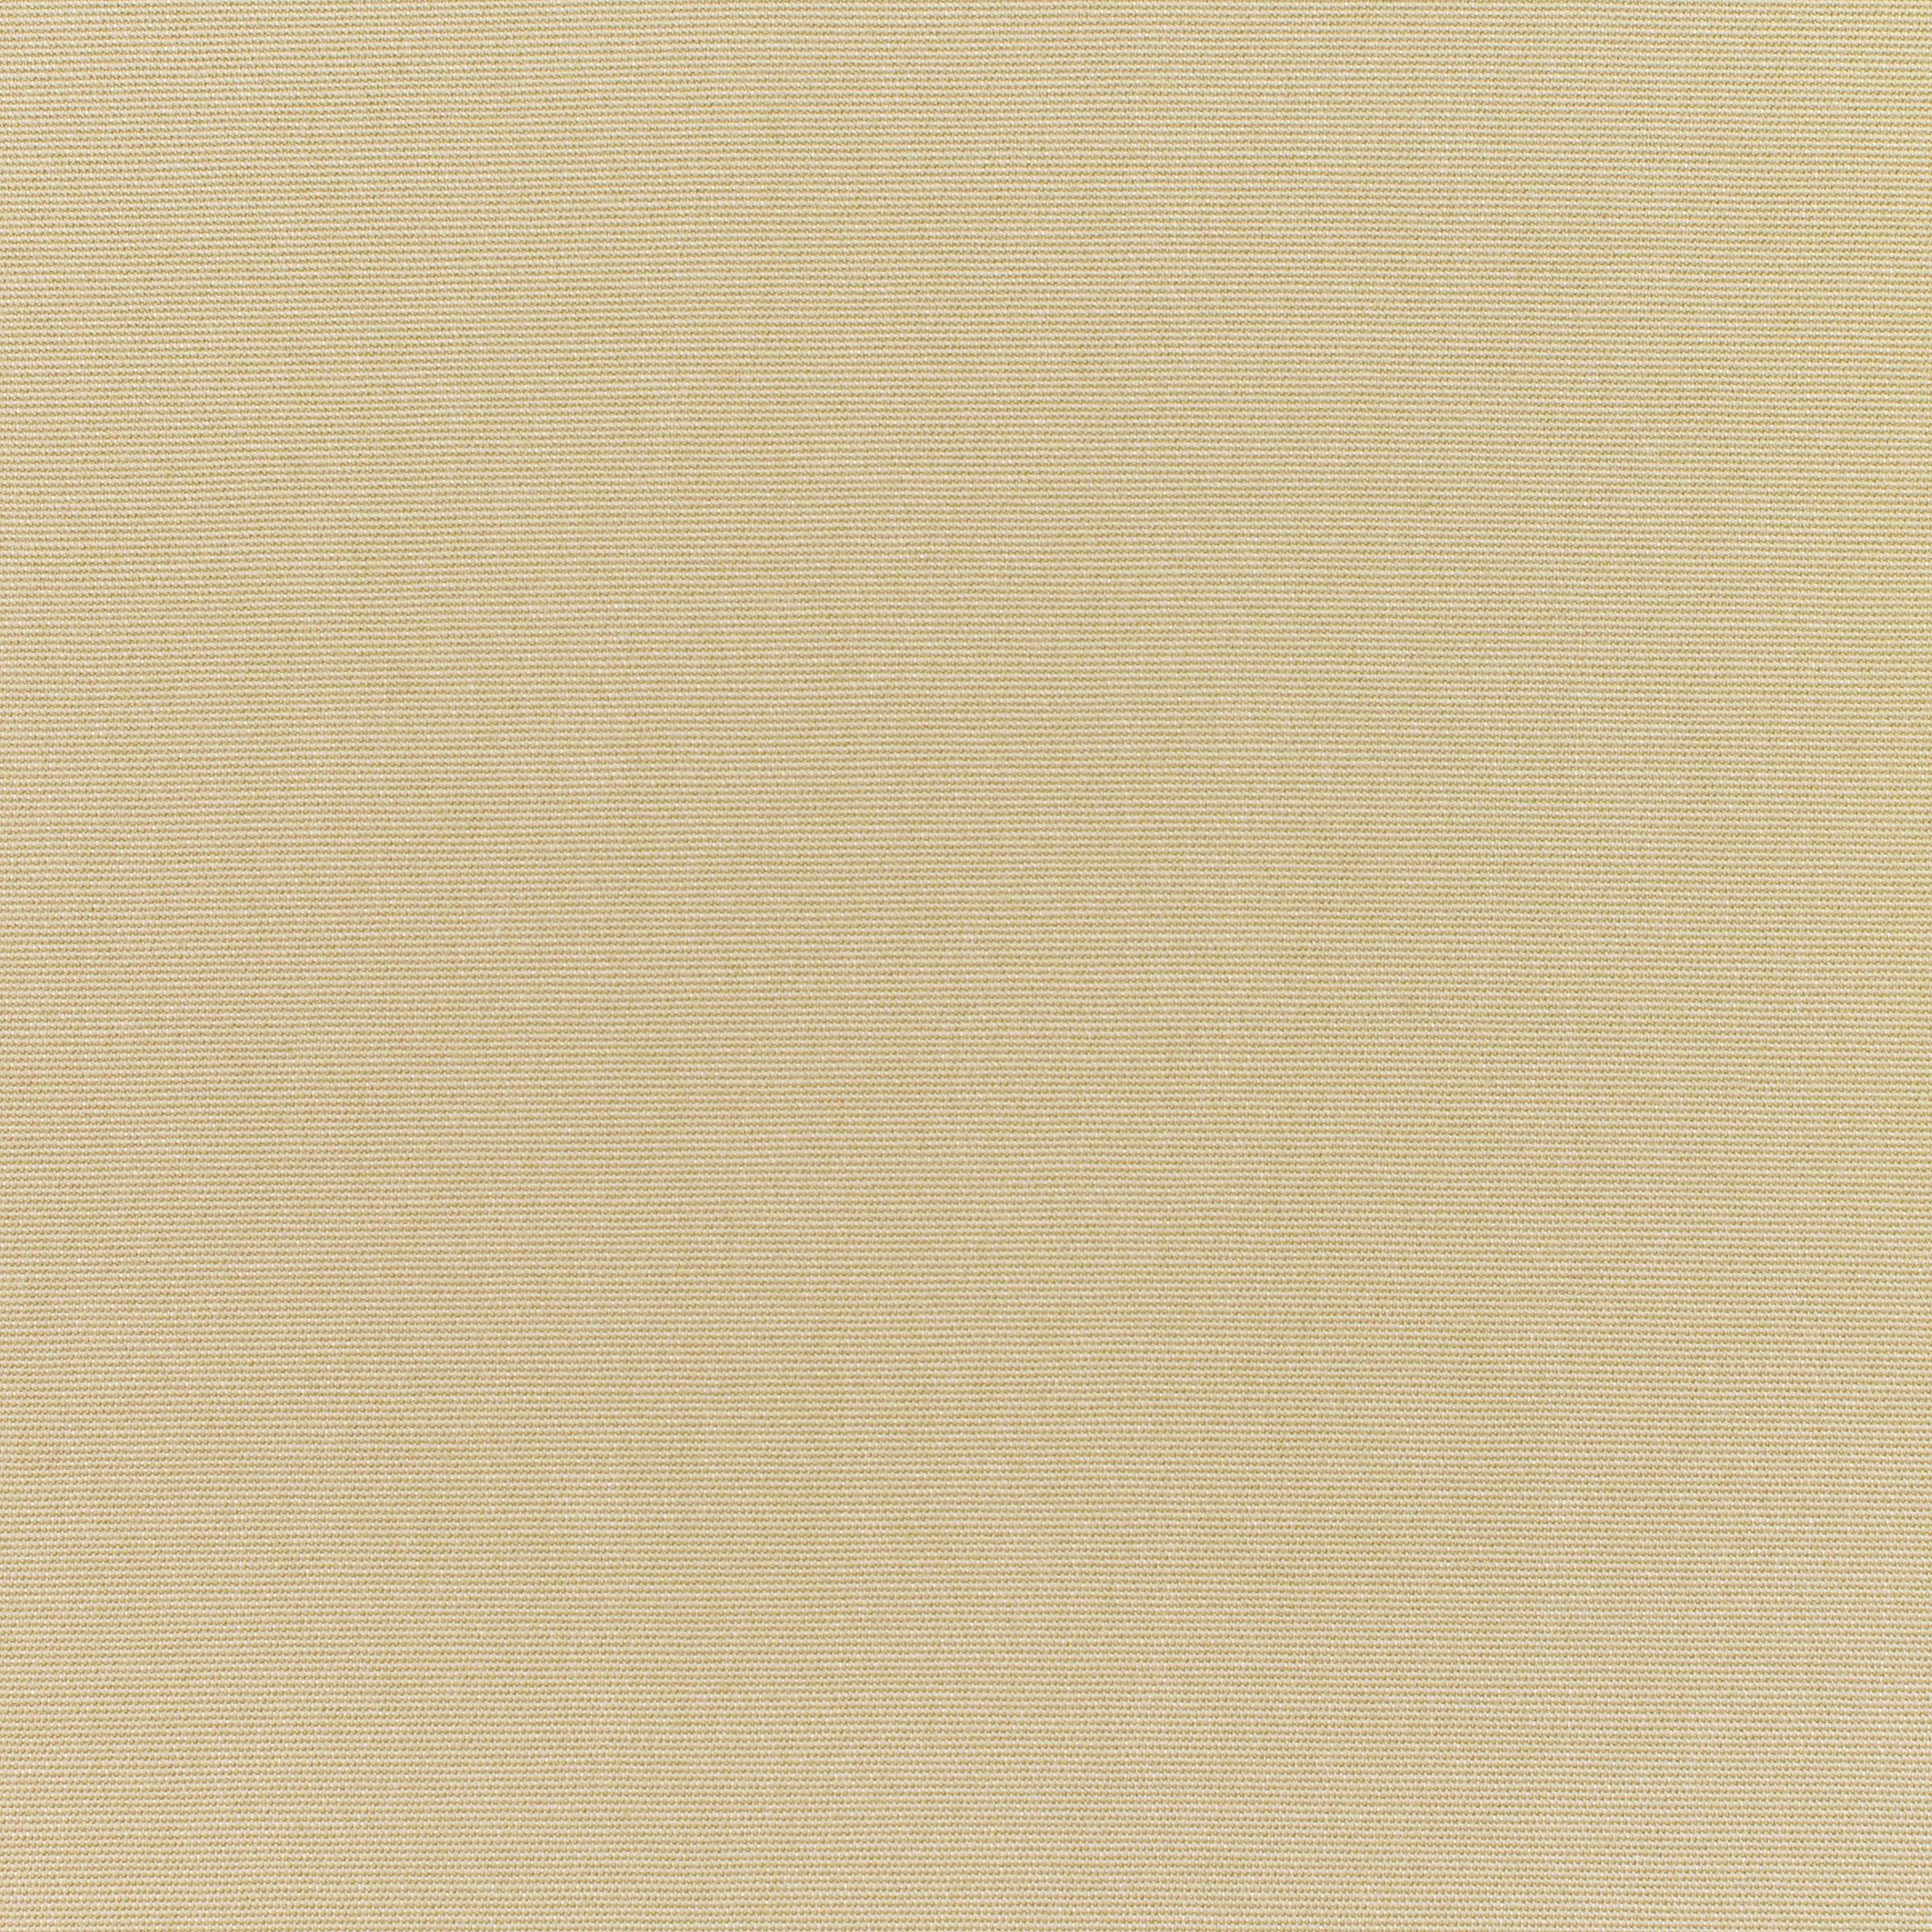 Canvas Antique Beige 5422-0000 « Quality Fabrics | Wall Art ...